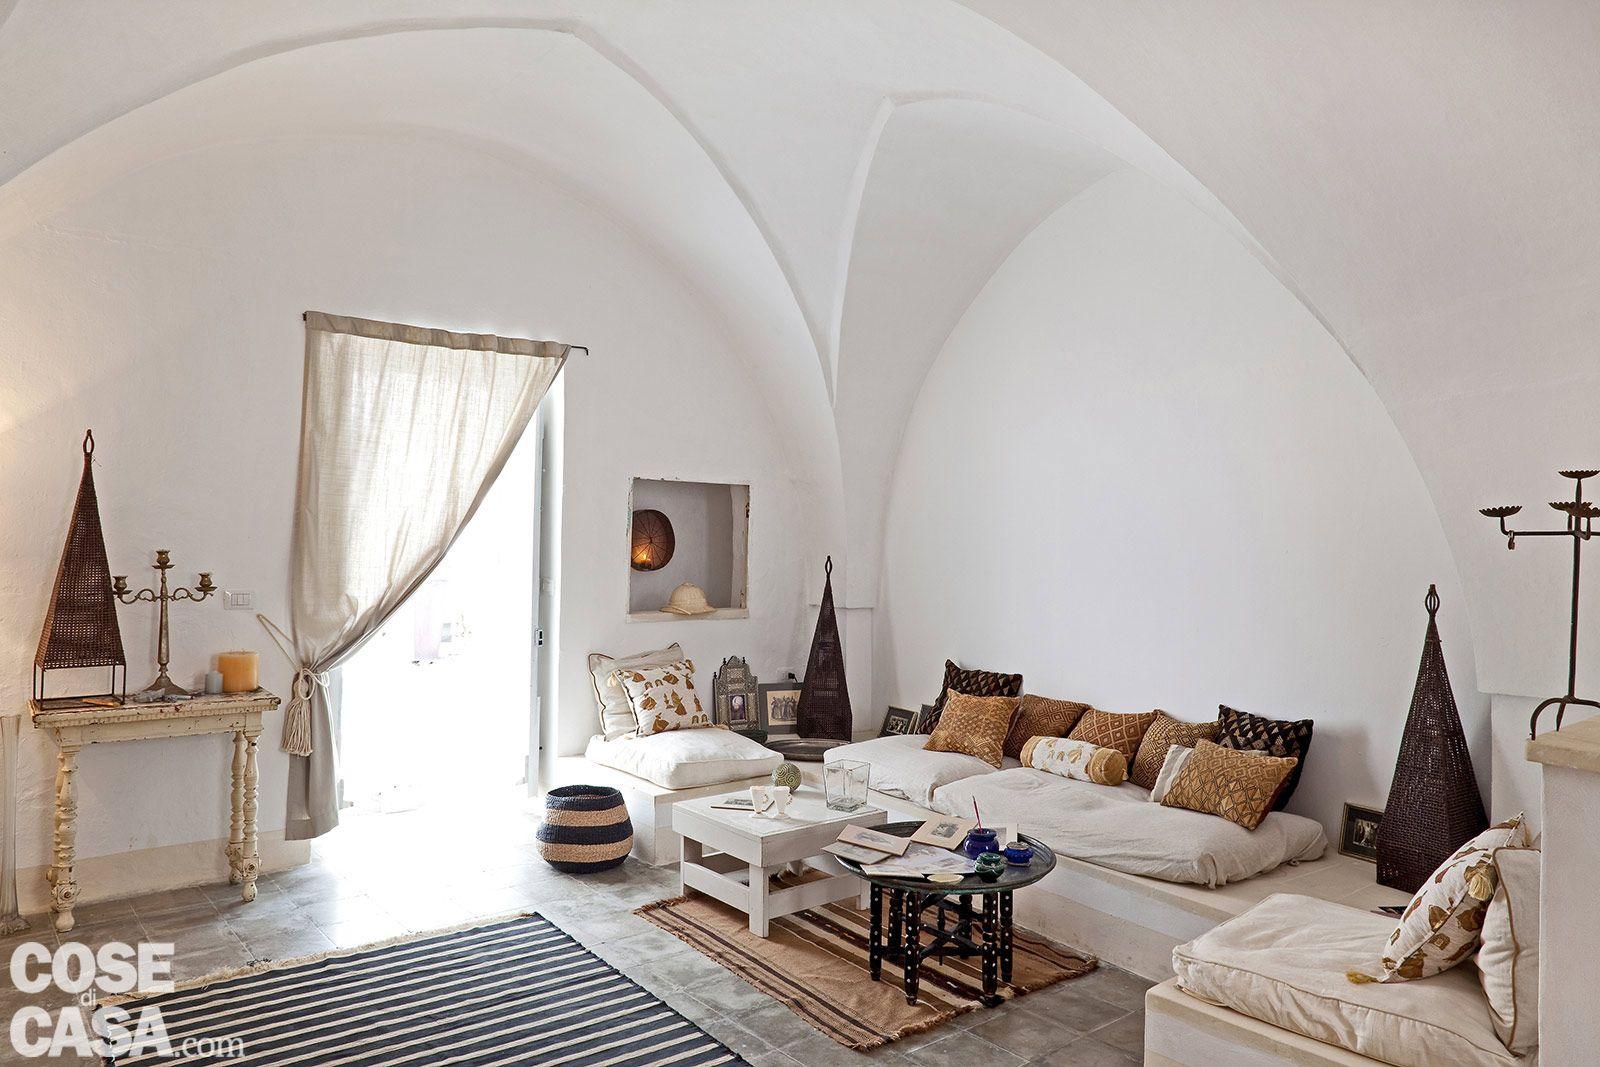 Una casa in pietra in stile mediterraneo acquario for Case in stile mediterraneo